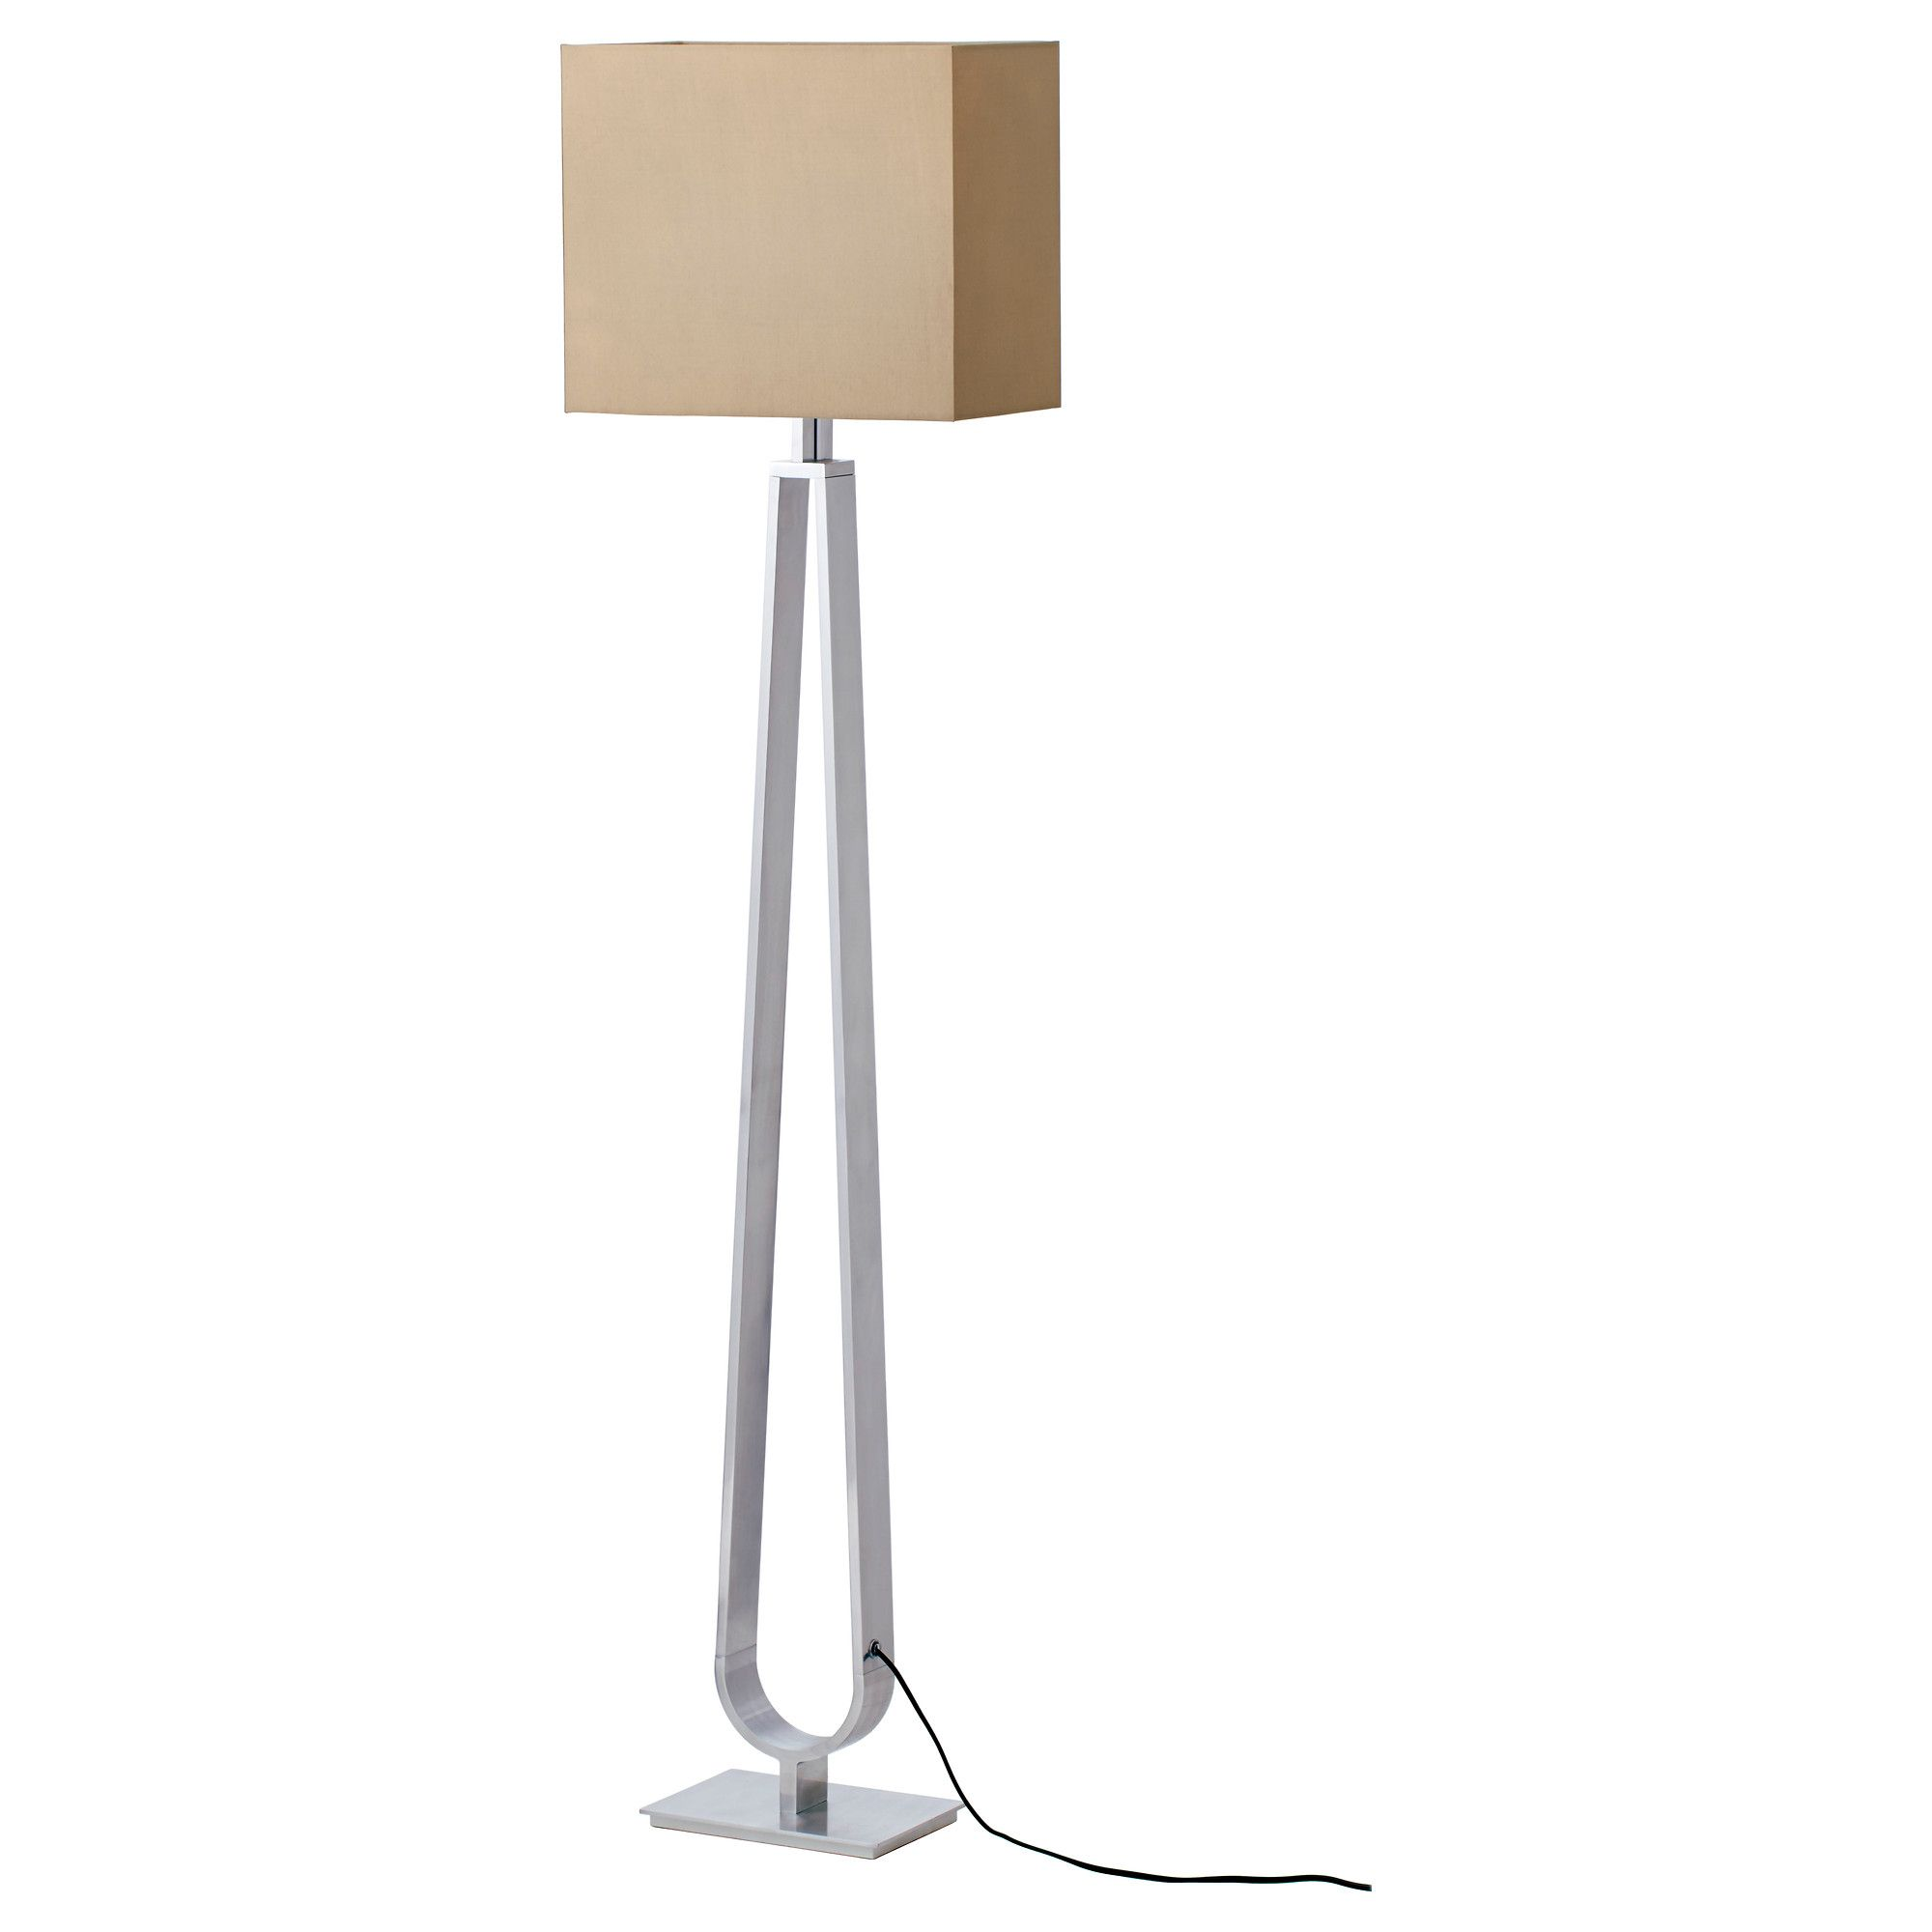 Us Furniture And Home Furnishings Adjustable Floor Lamp Floor